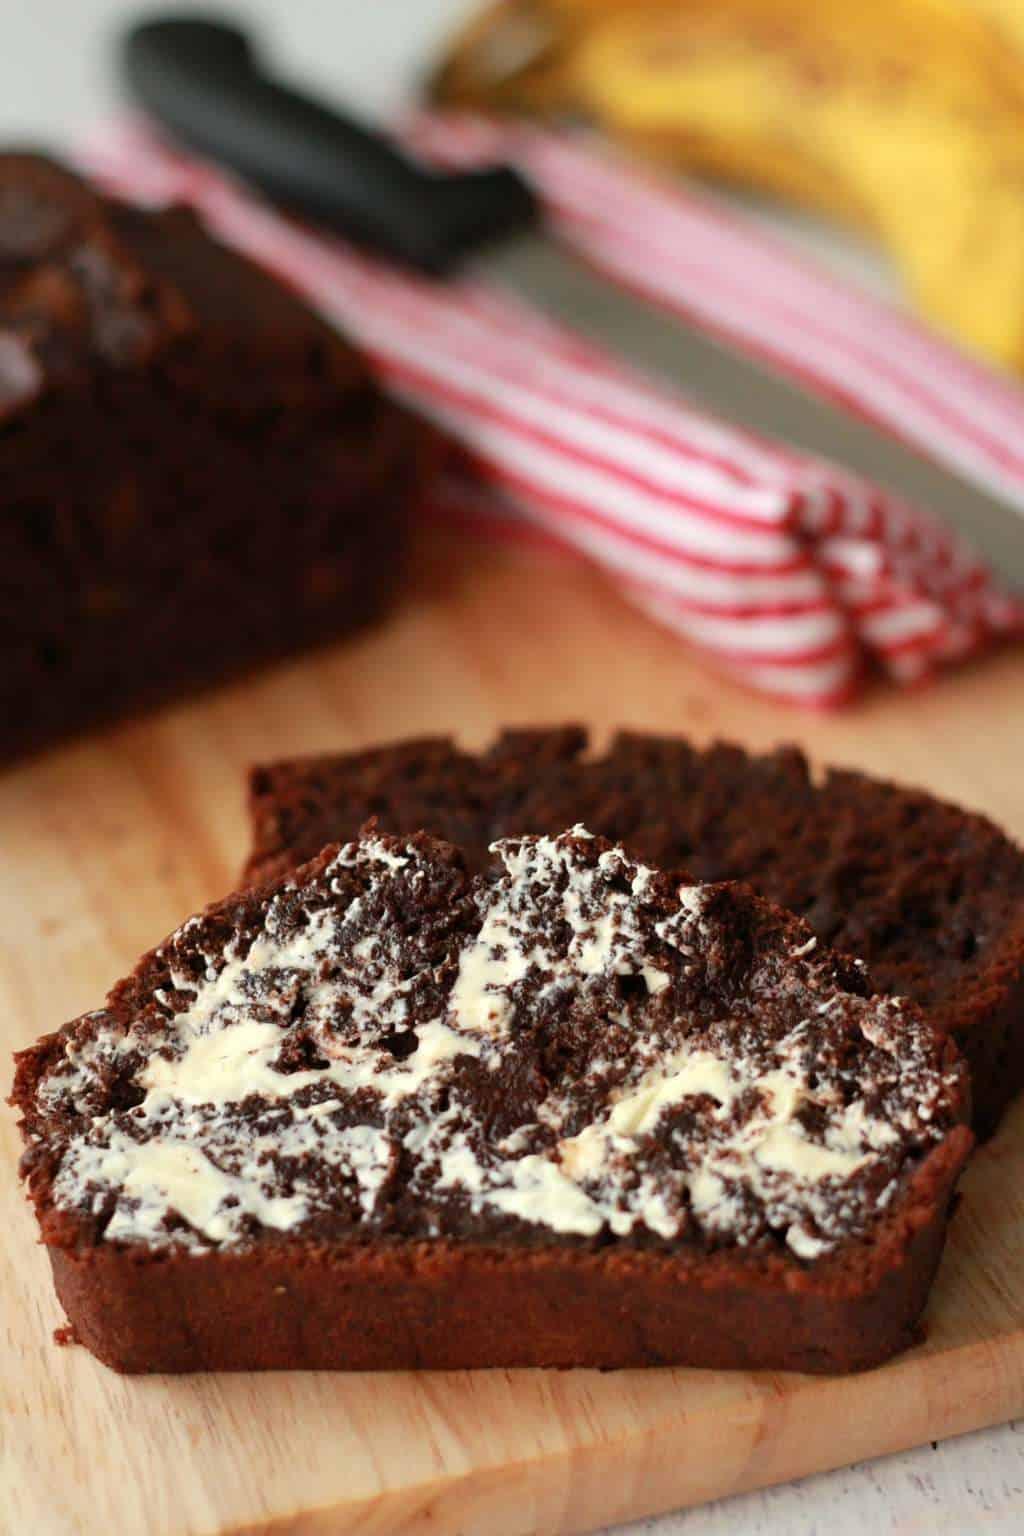 Vegan Chocolate Chip Banana Bread #vegan #lovingitvegan #bananabread #dessert #chocolatechip